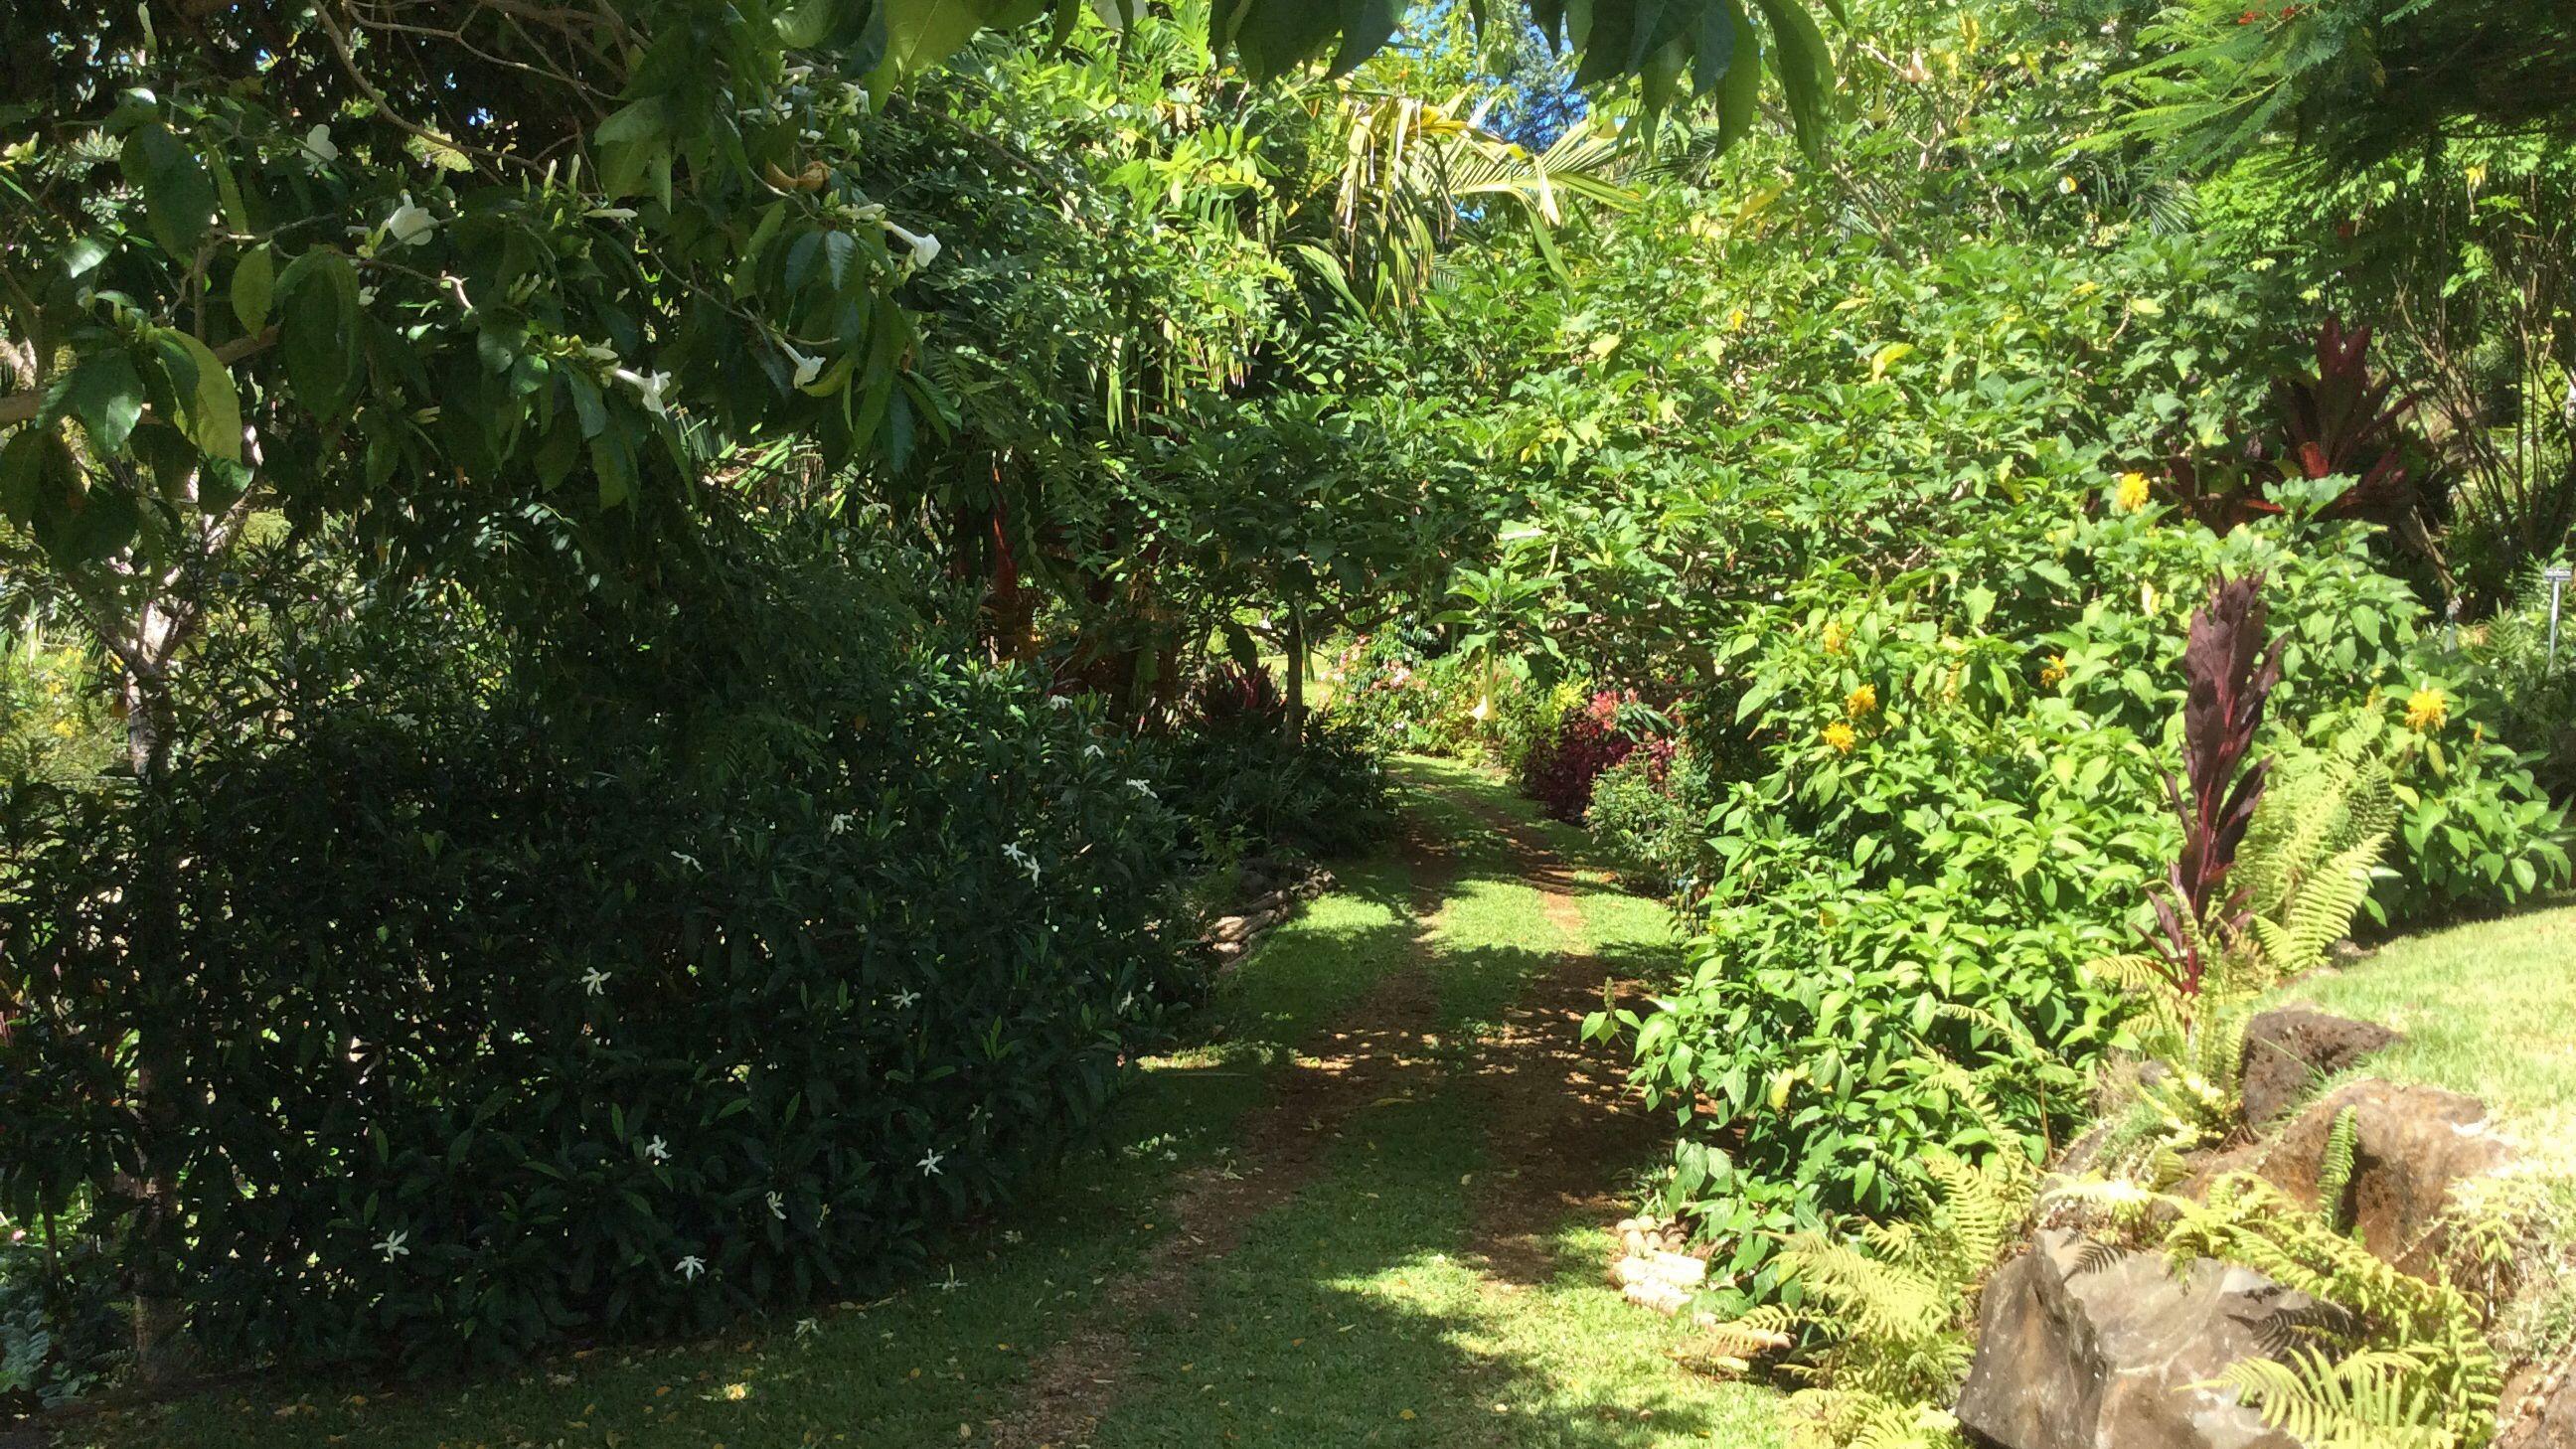 Garden path in Kauai